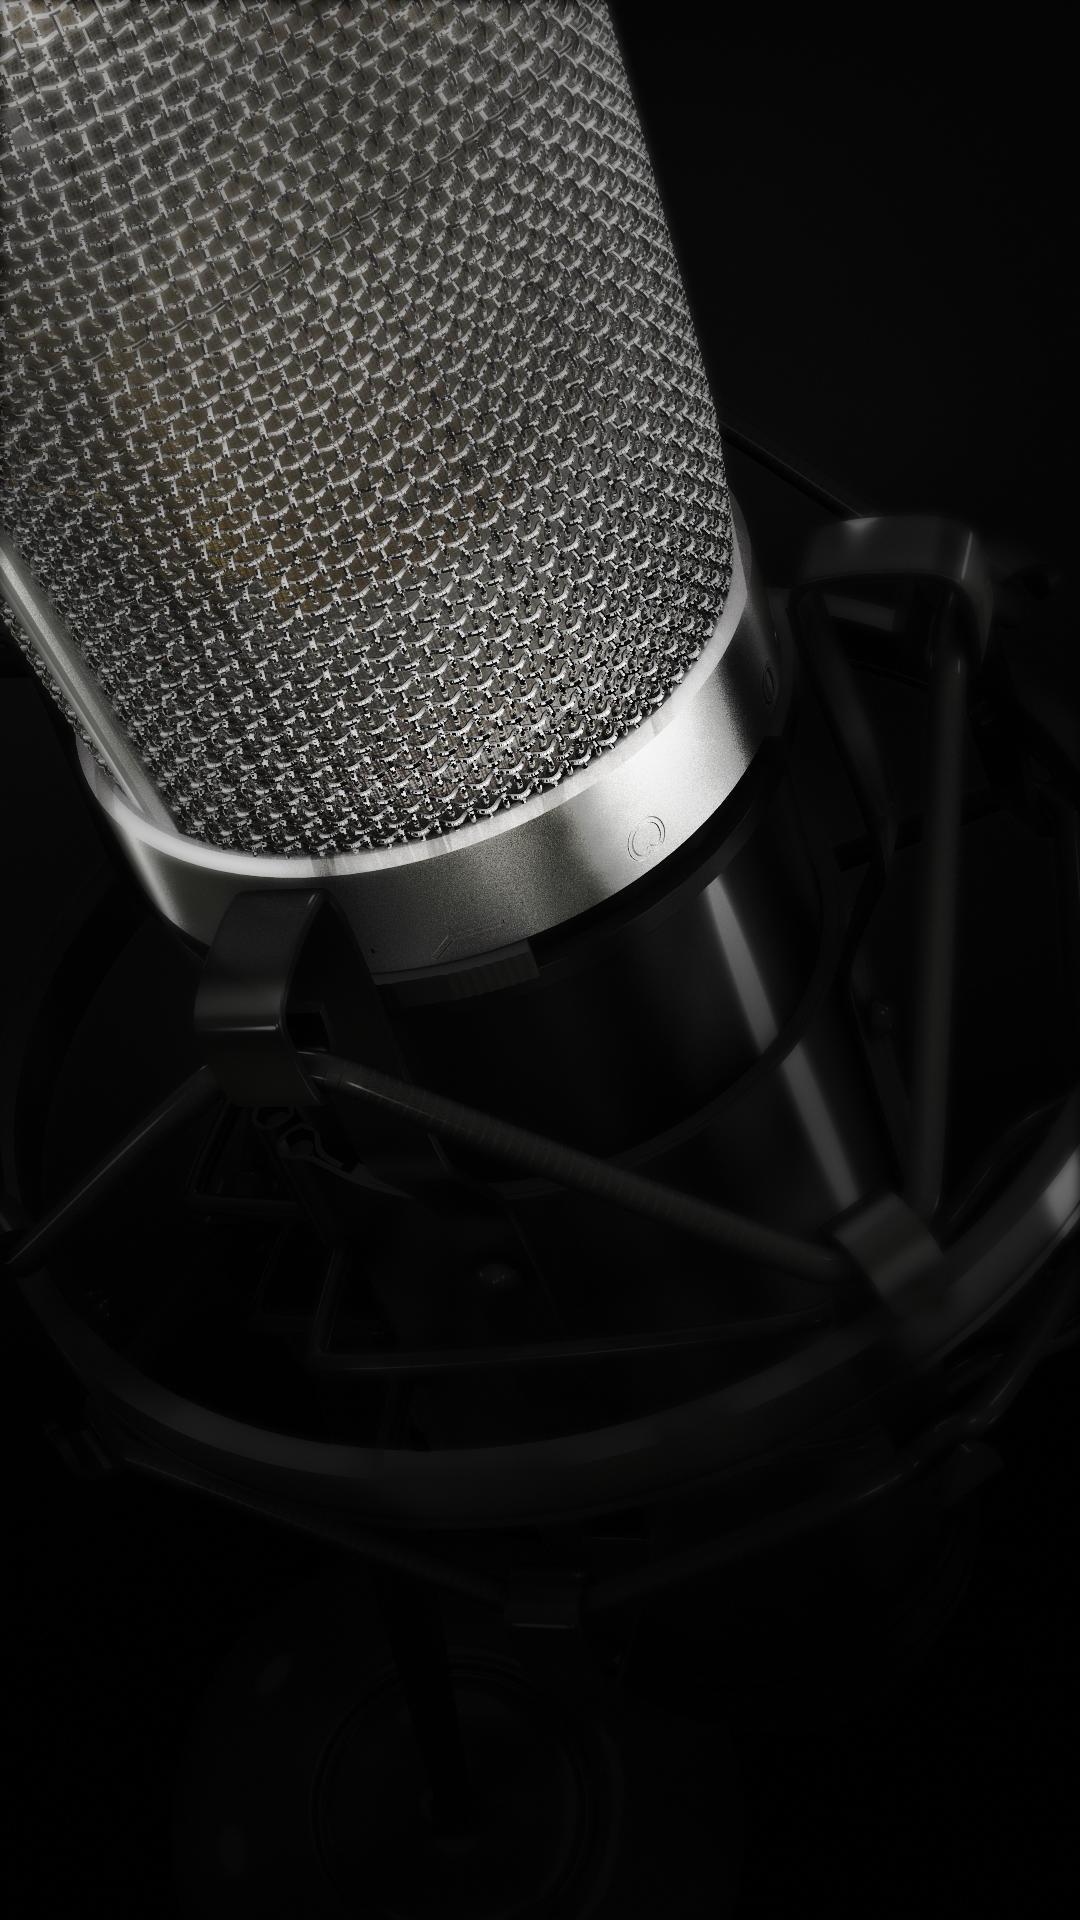 StudioMicrophone_CloseUp_Render_02